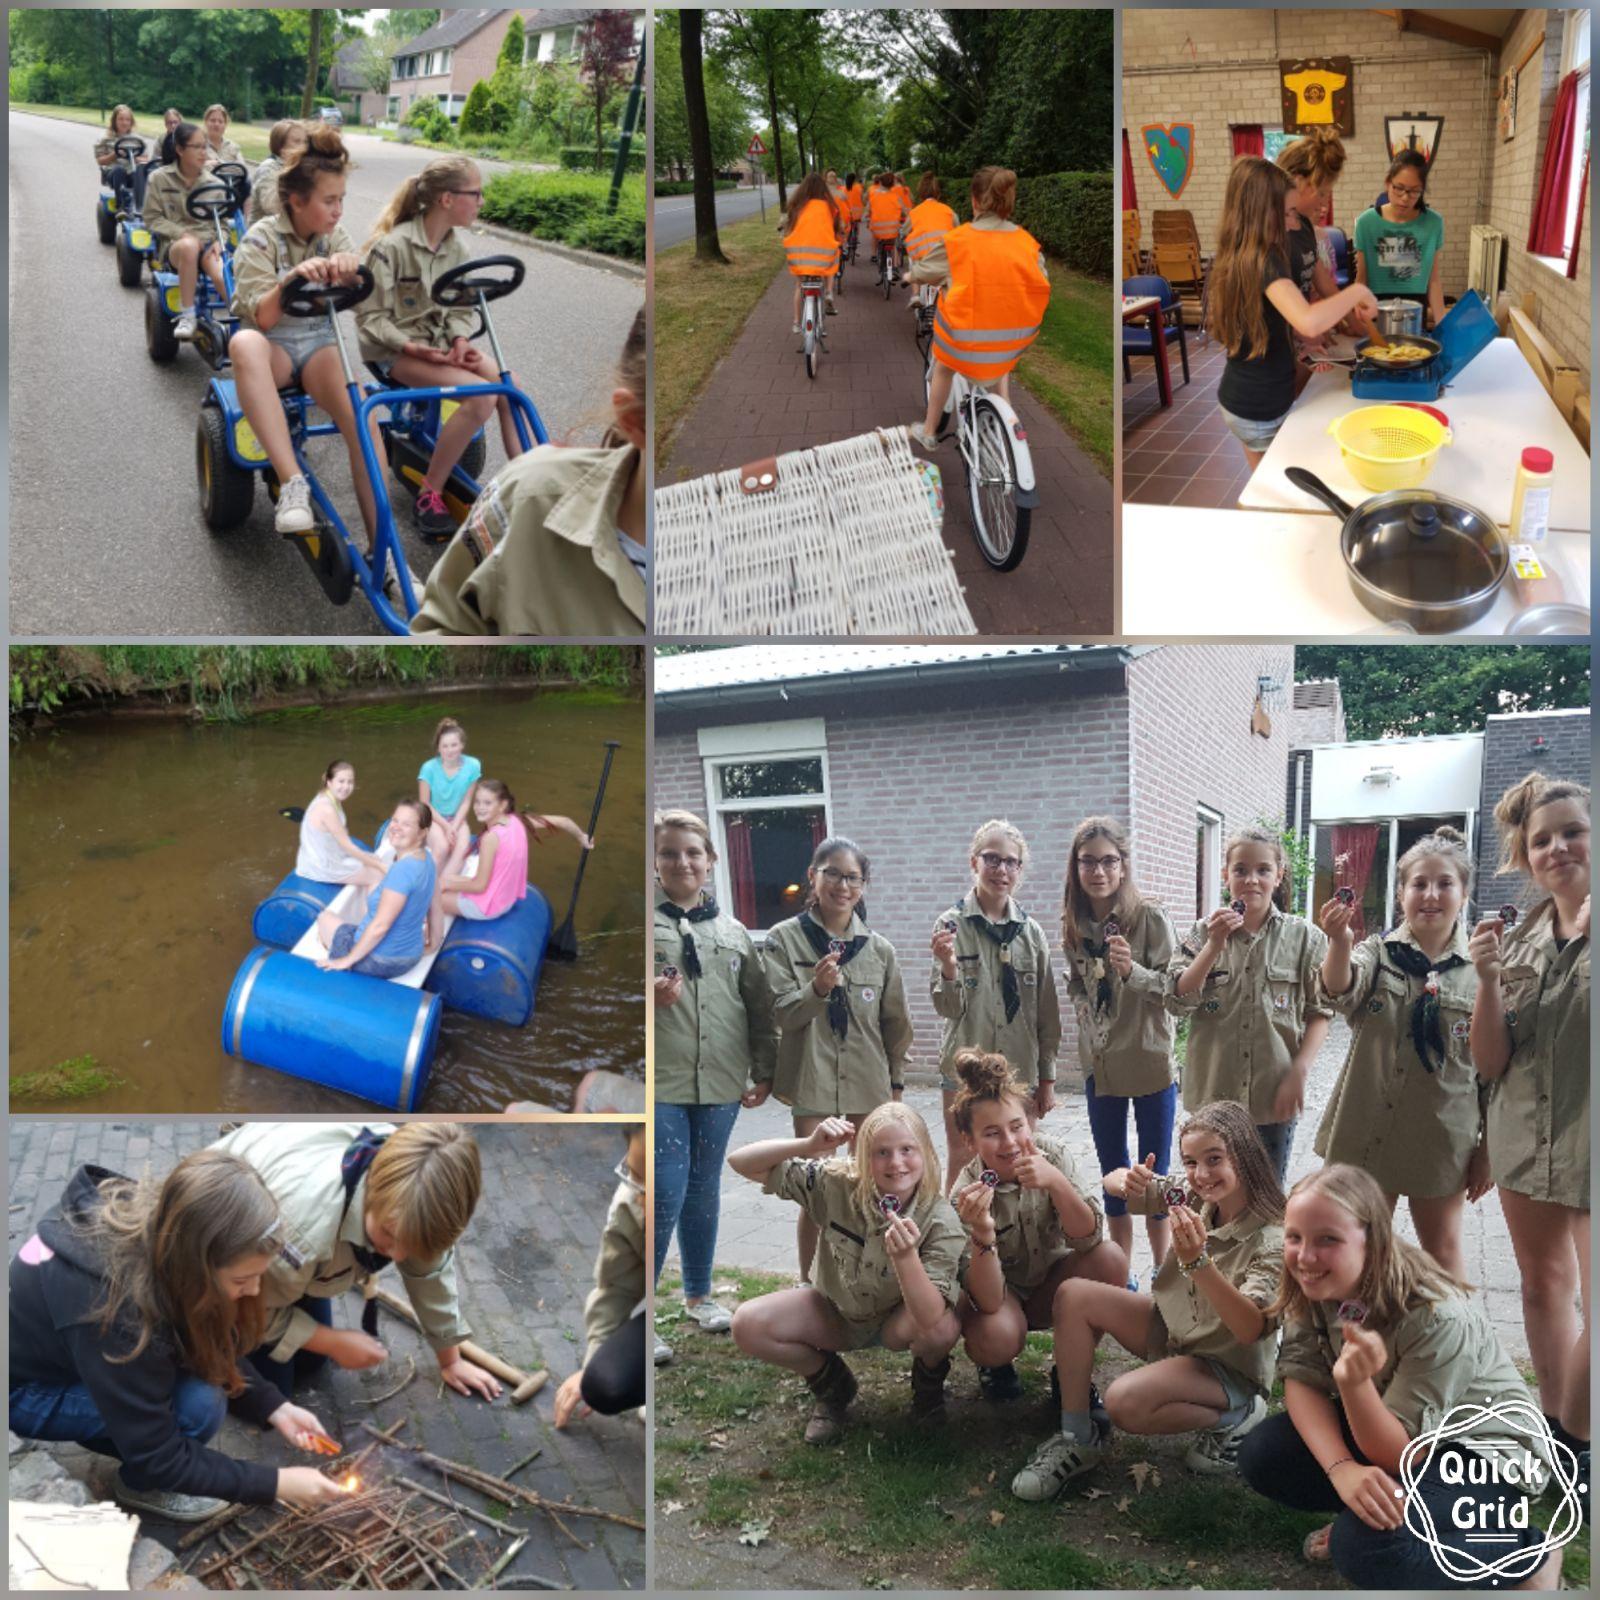 Fotocollage Scoutsweekend Juni 2017